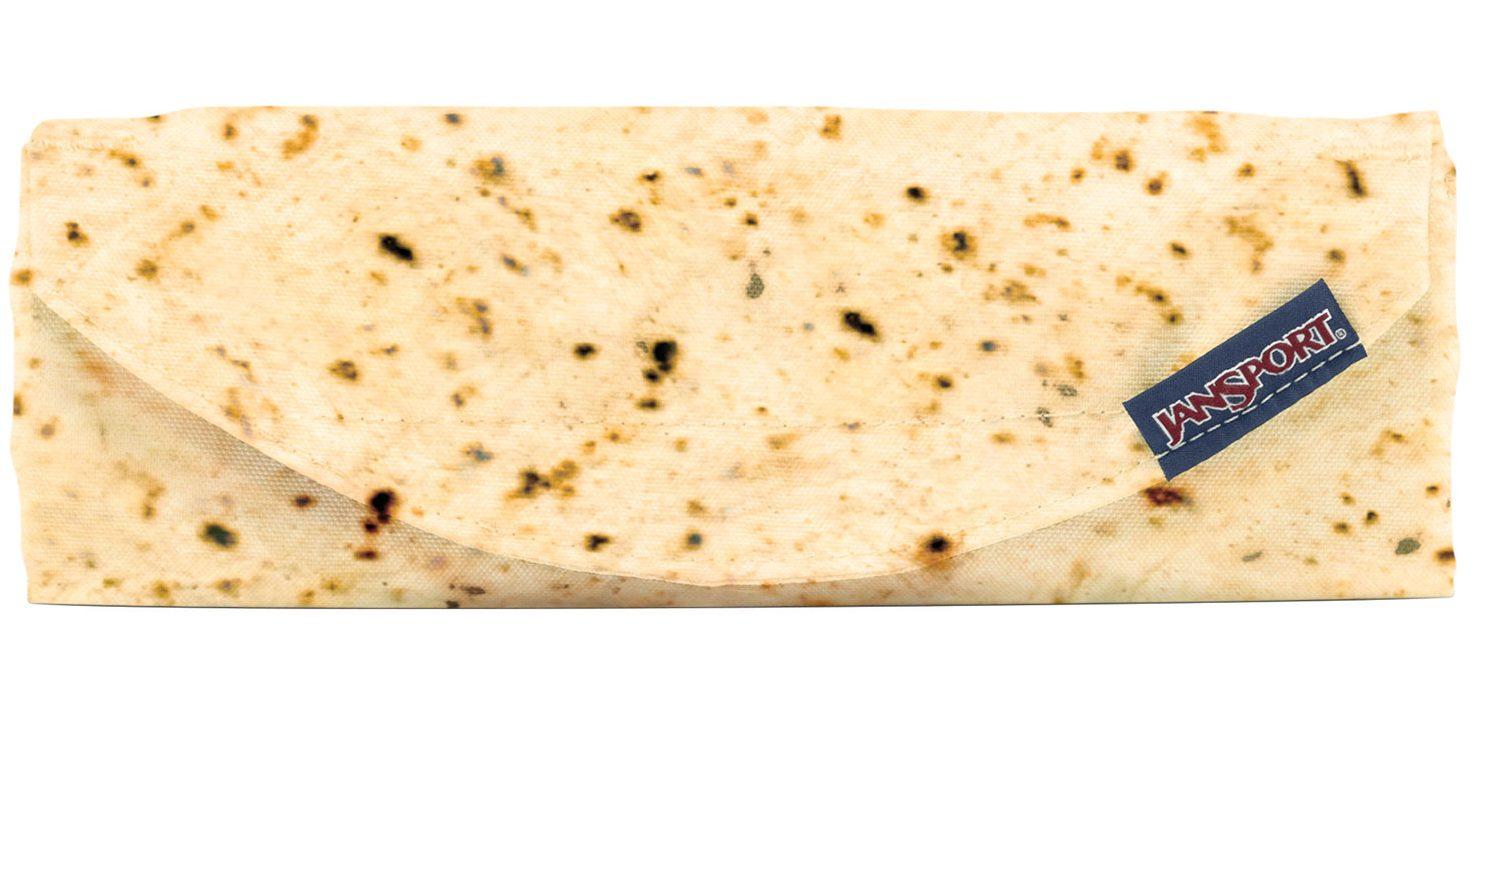 Jansport burrito bag